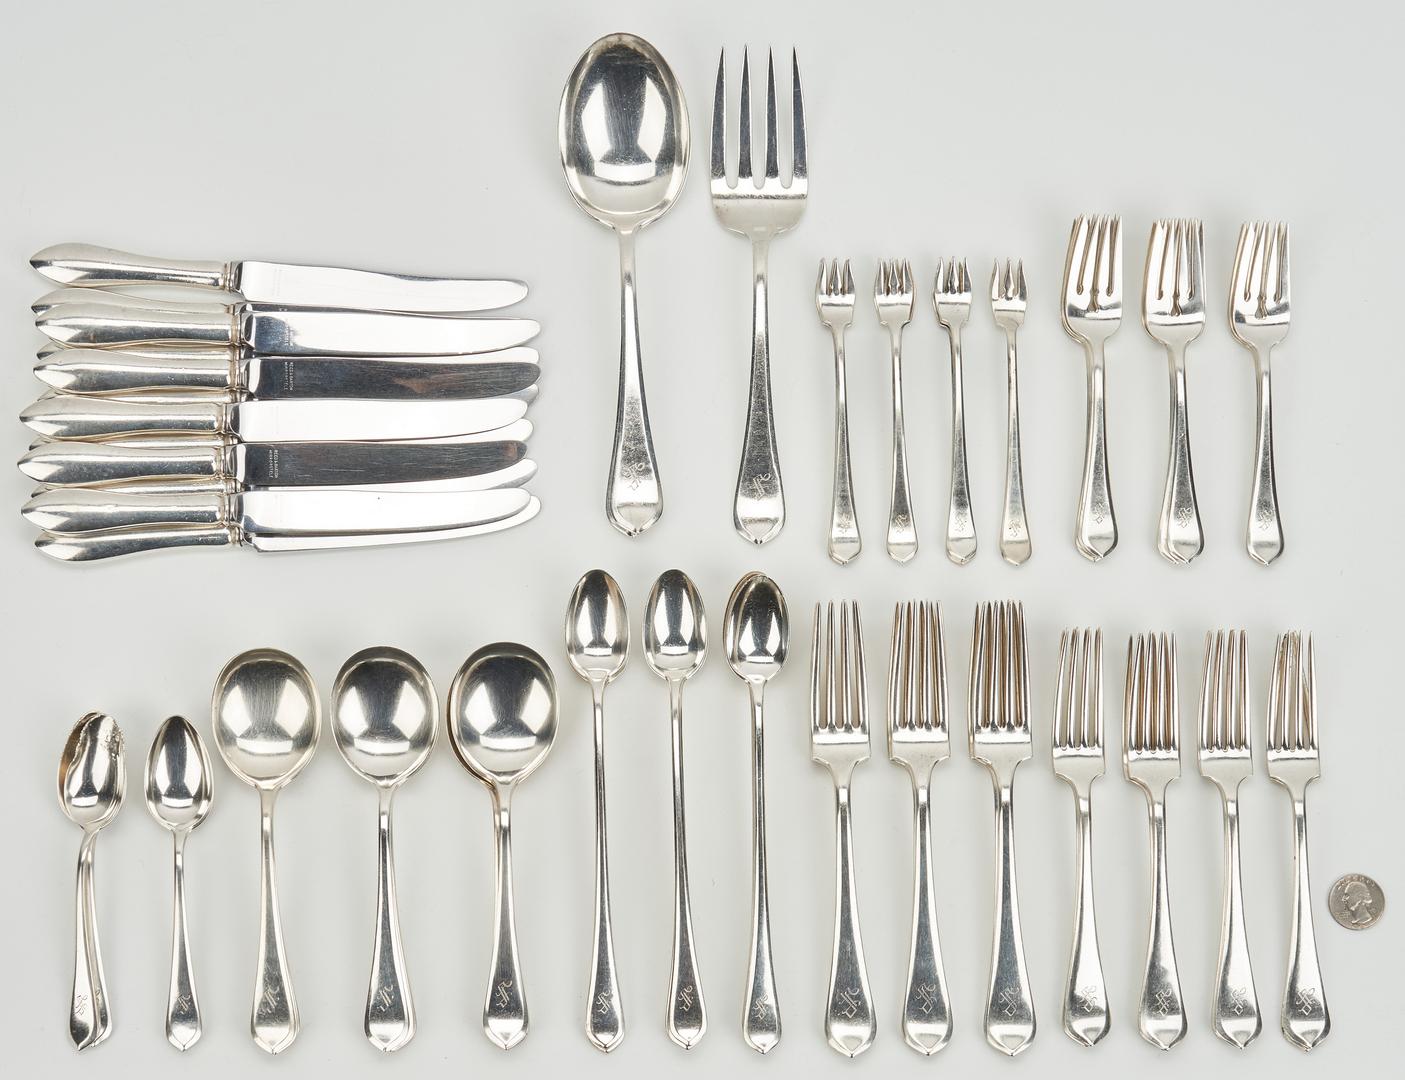 Lot 244: 87 Pcs. Gorham Old London-Plain Sterling Silver Flatware